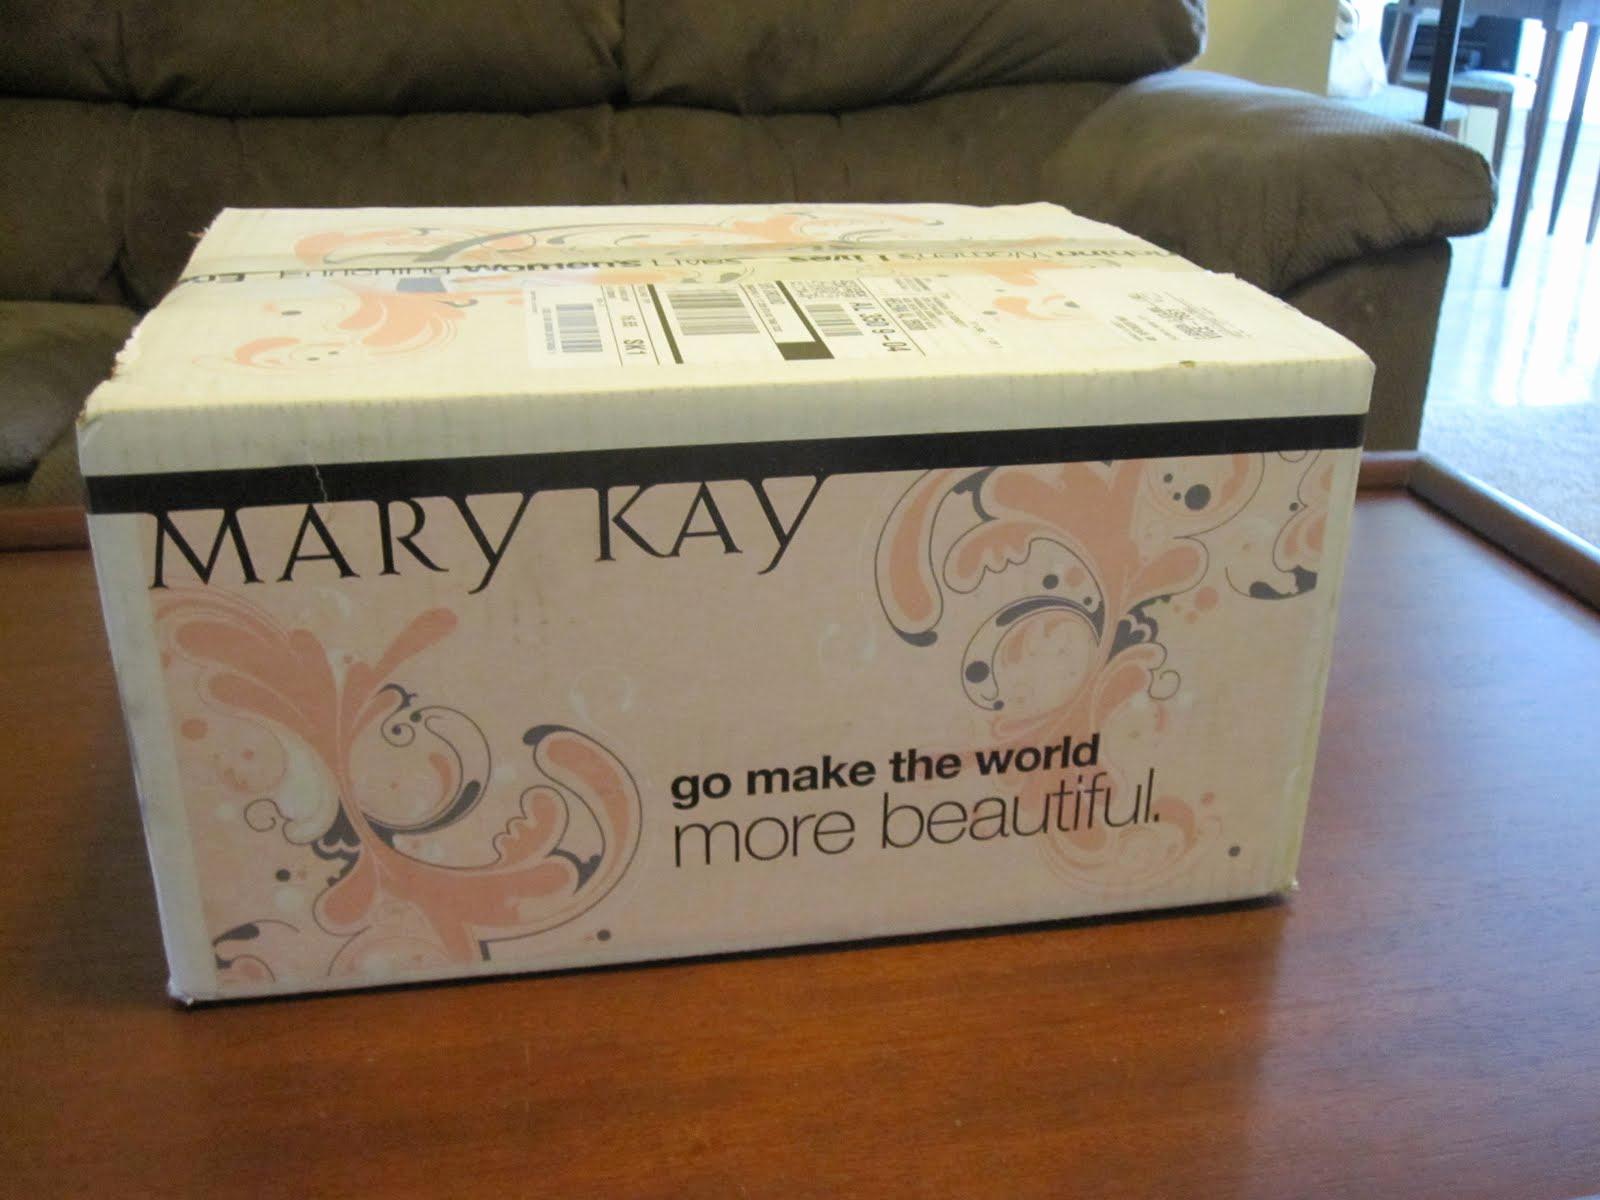 Mary Kay Debut Party Invitation Elegant Mary Kay Debut